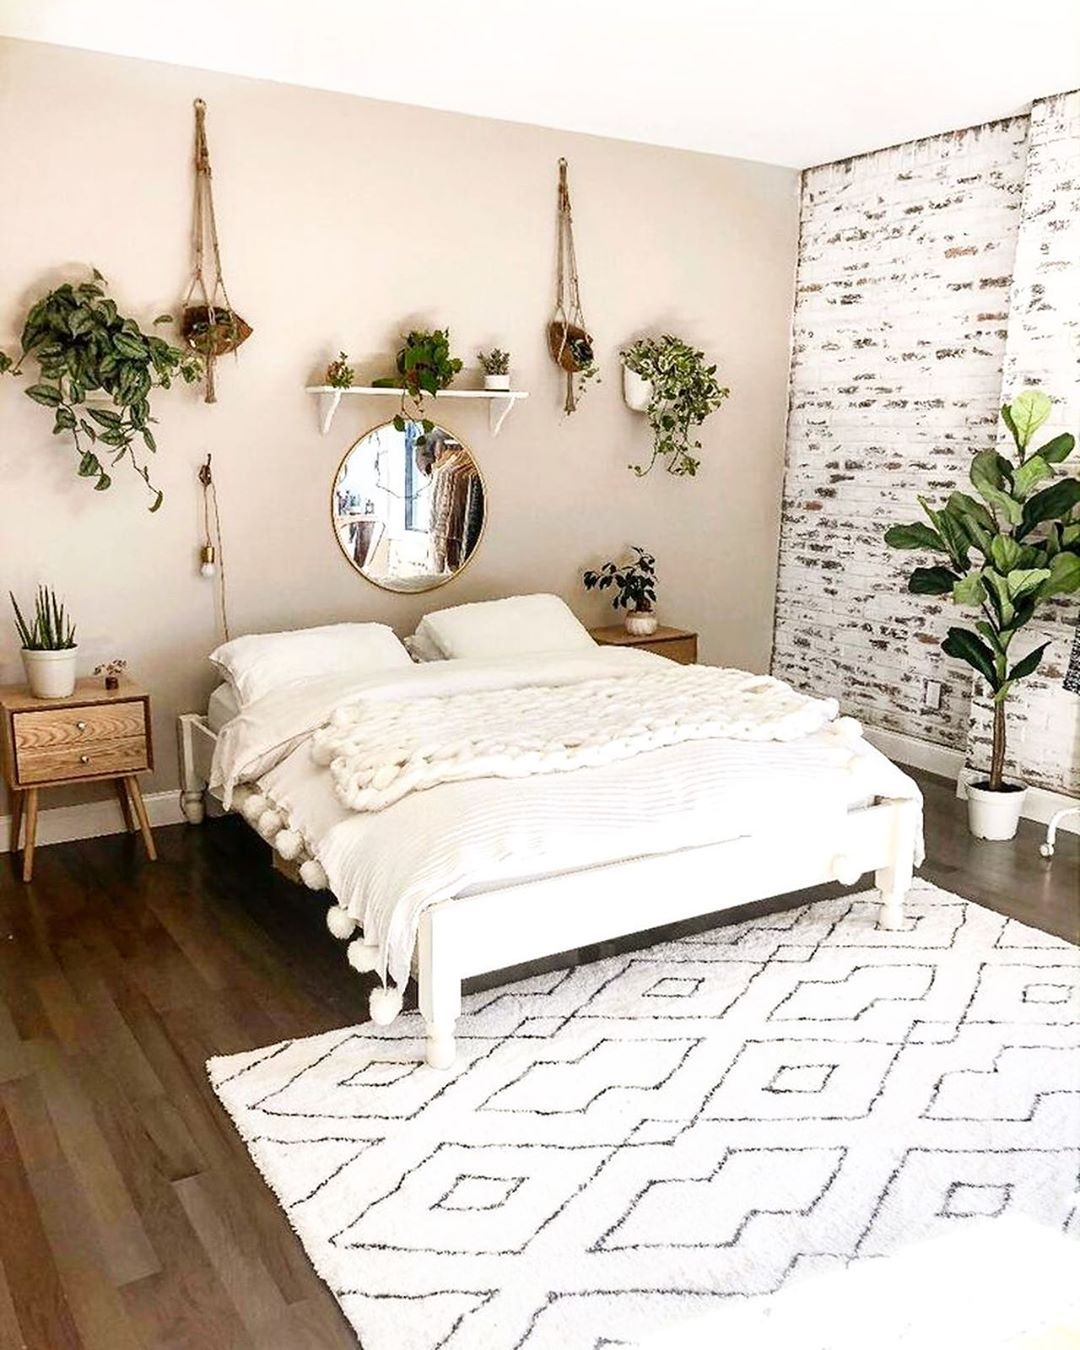 Indoor Plants Are A Must Bedroom Modern Plants Interior Decor Fresh Inspiration Minimalist Bedroom Decor Bedroom Interior Bedroom Decor Inspiration